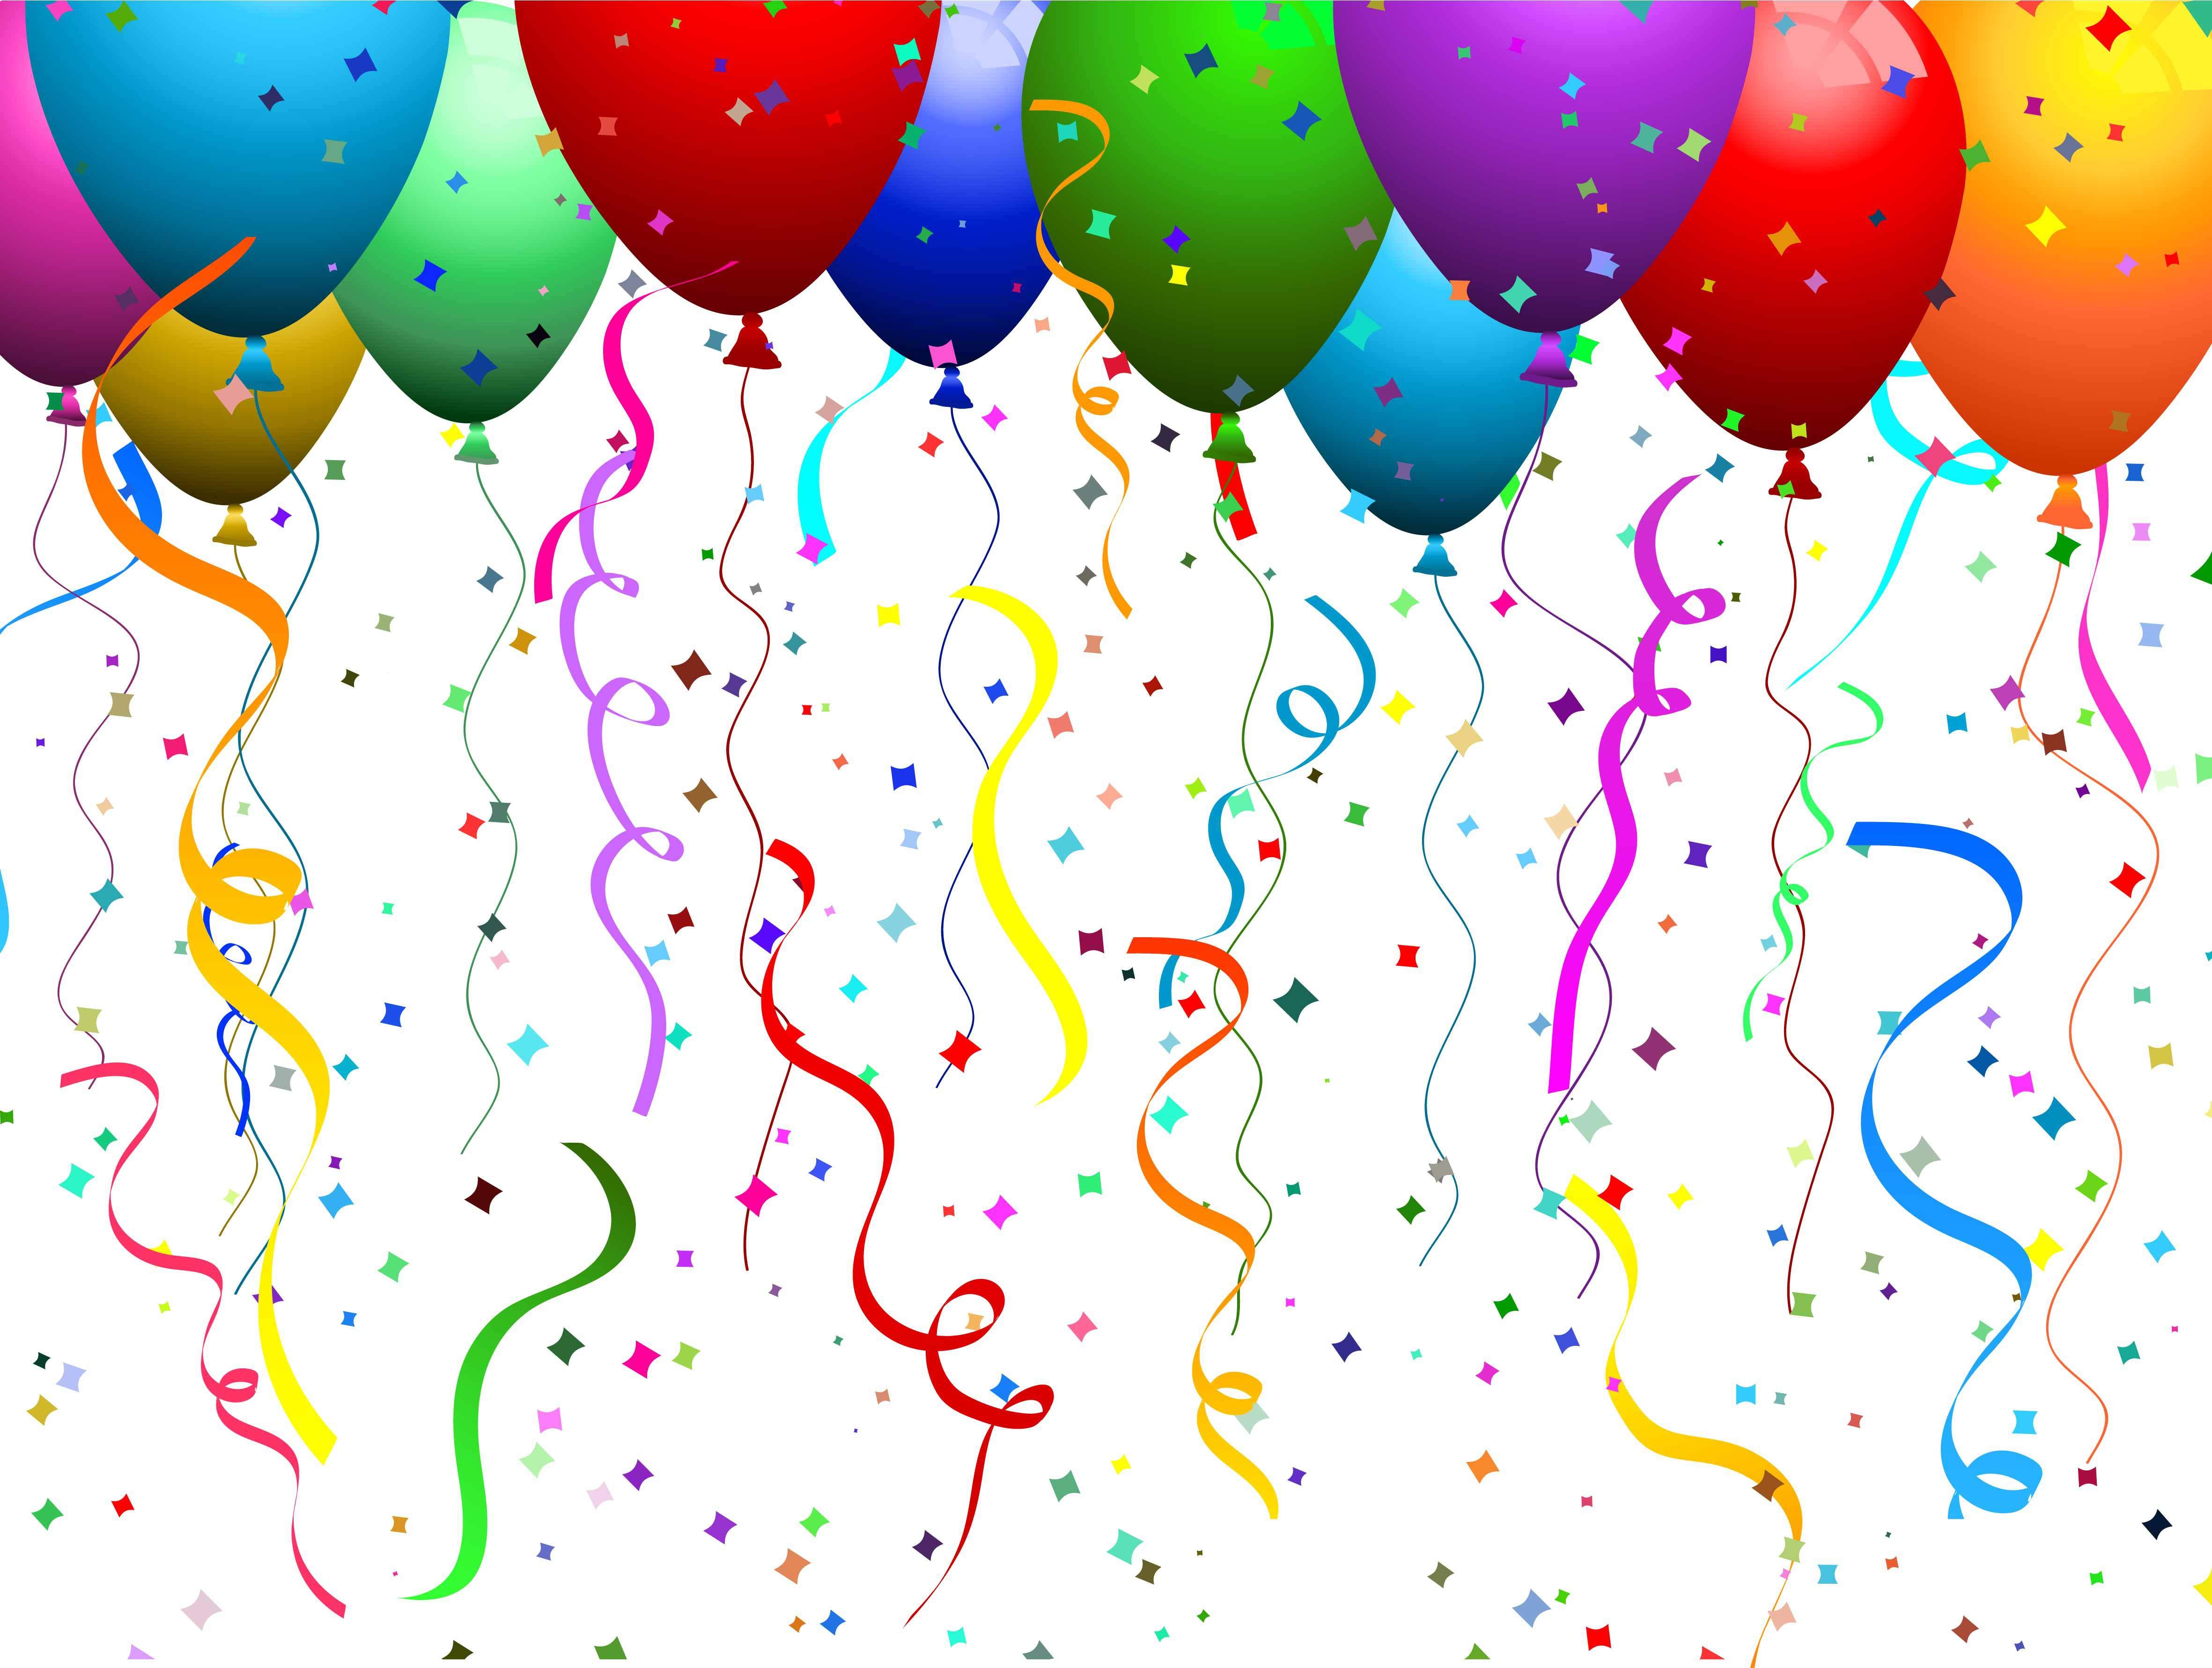 Birthday Balloons Wallpaper 4724x3563